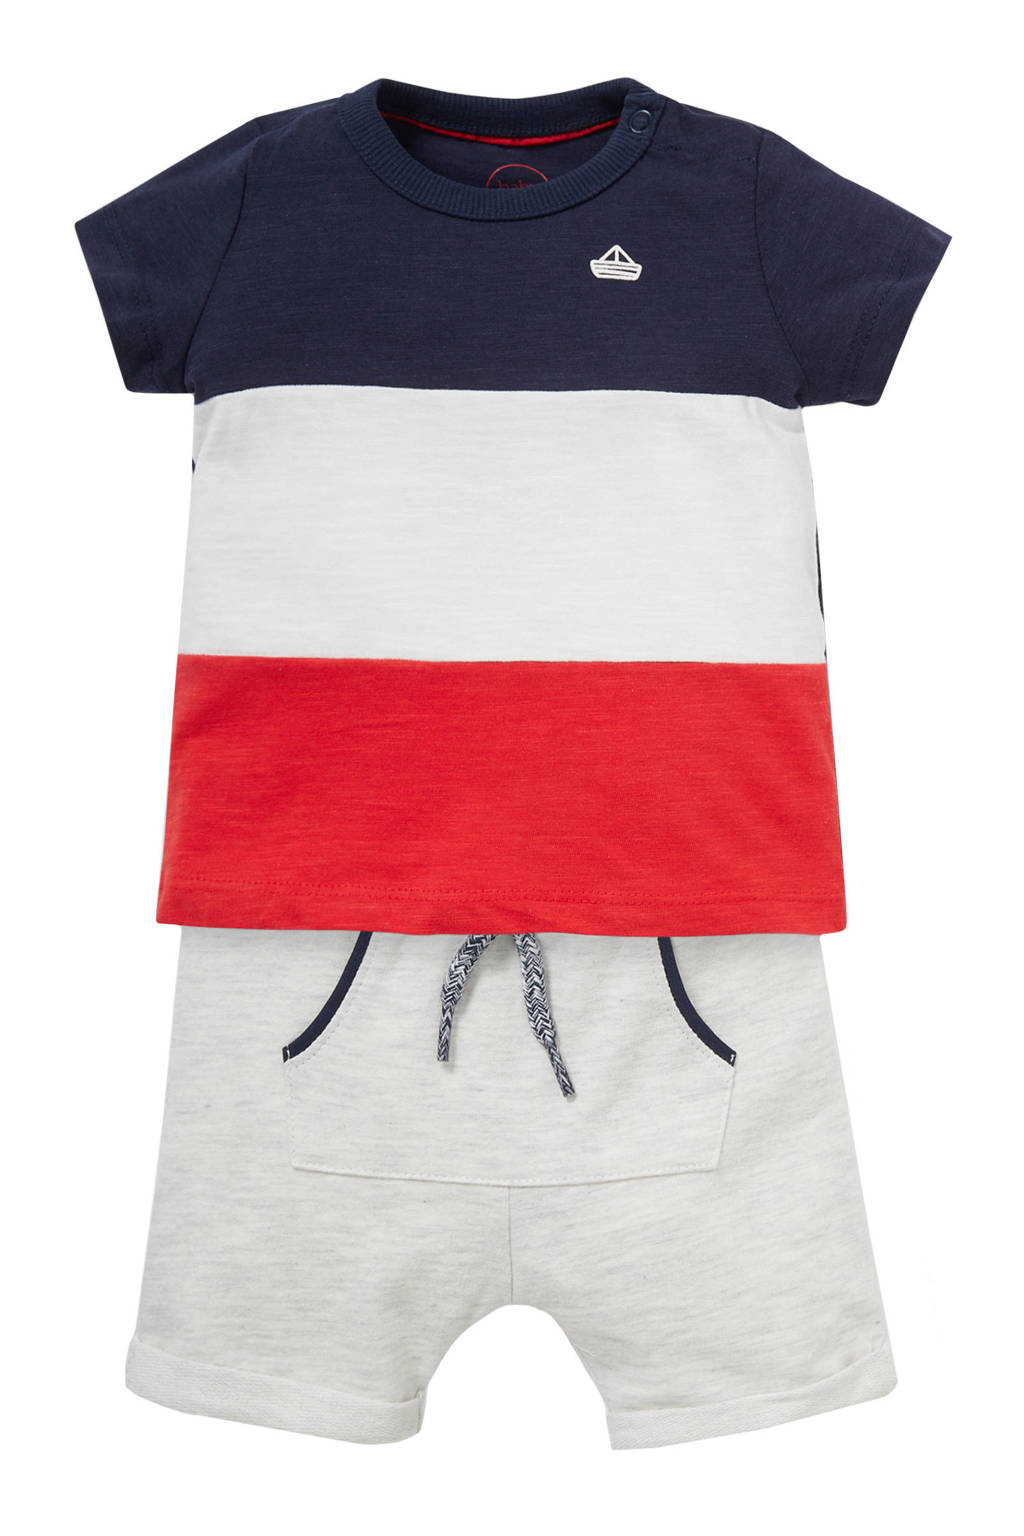 C&A Baby Club baby T-shirt + short donkerblauw/wit/rood, Donkerblauw/wit/rood